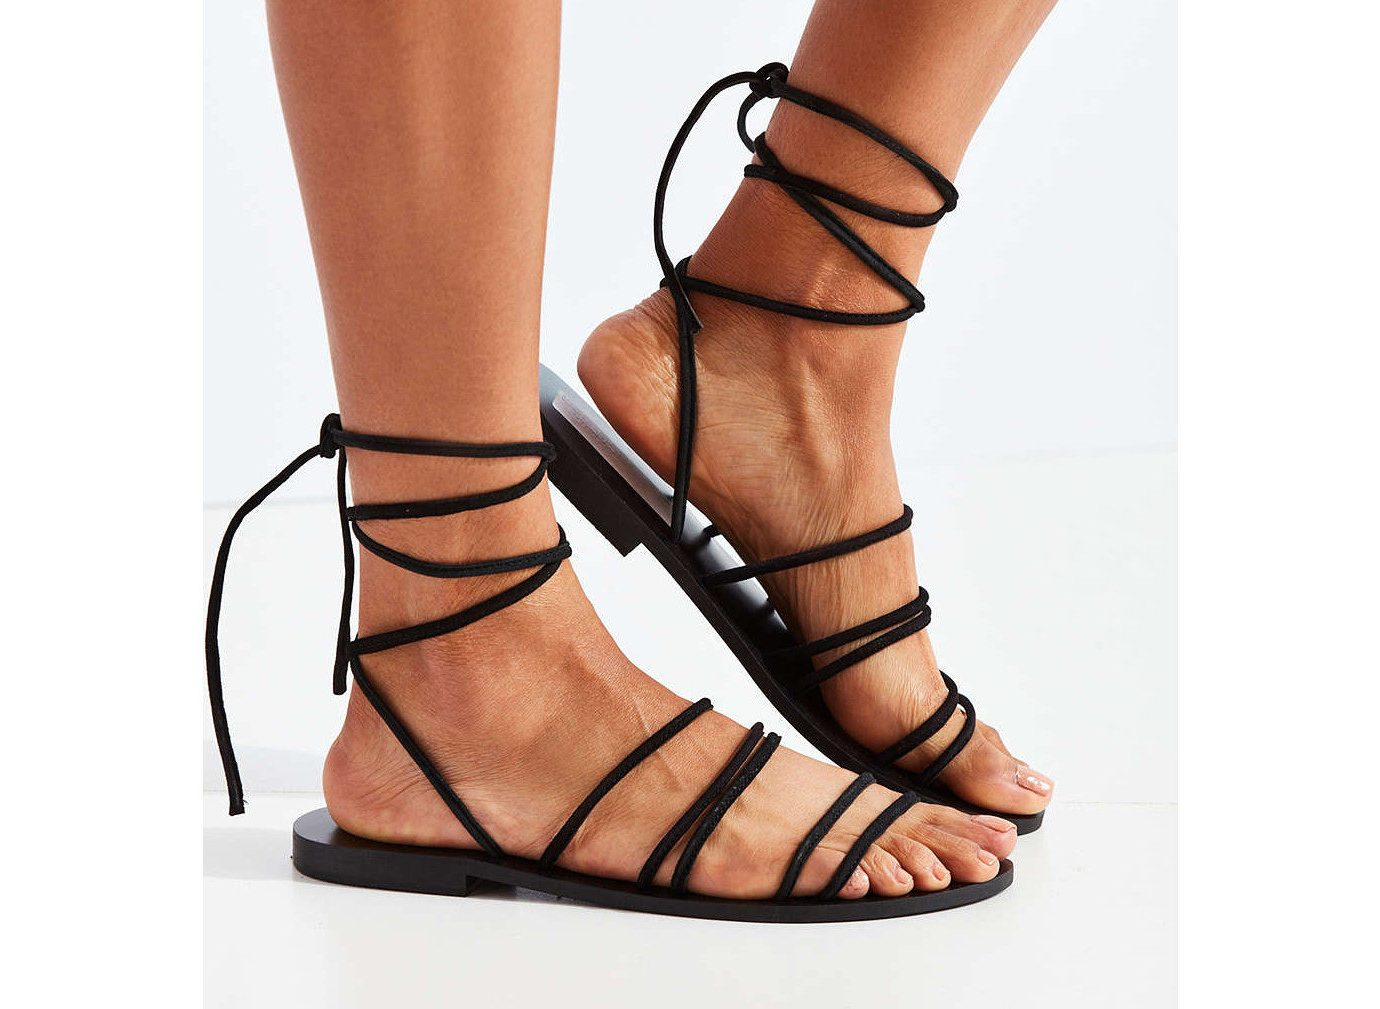 Style + Design footwear high heeled footwear shoe sandal human leg outdoor shoe joint boot legs shoes feet leather